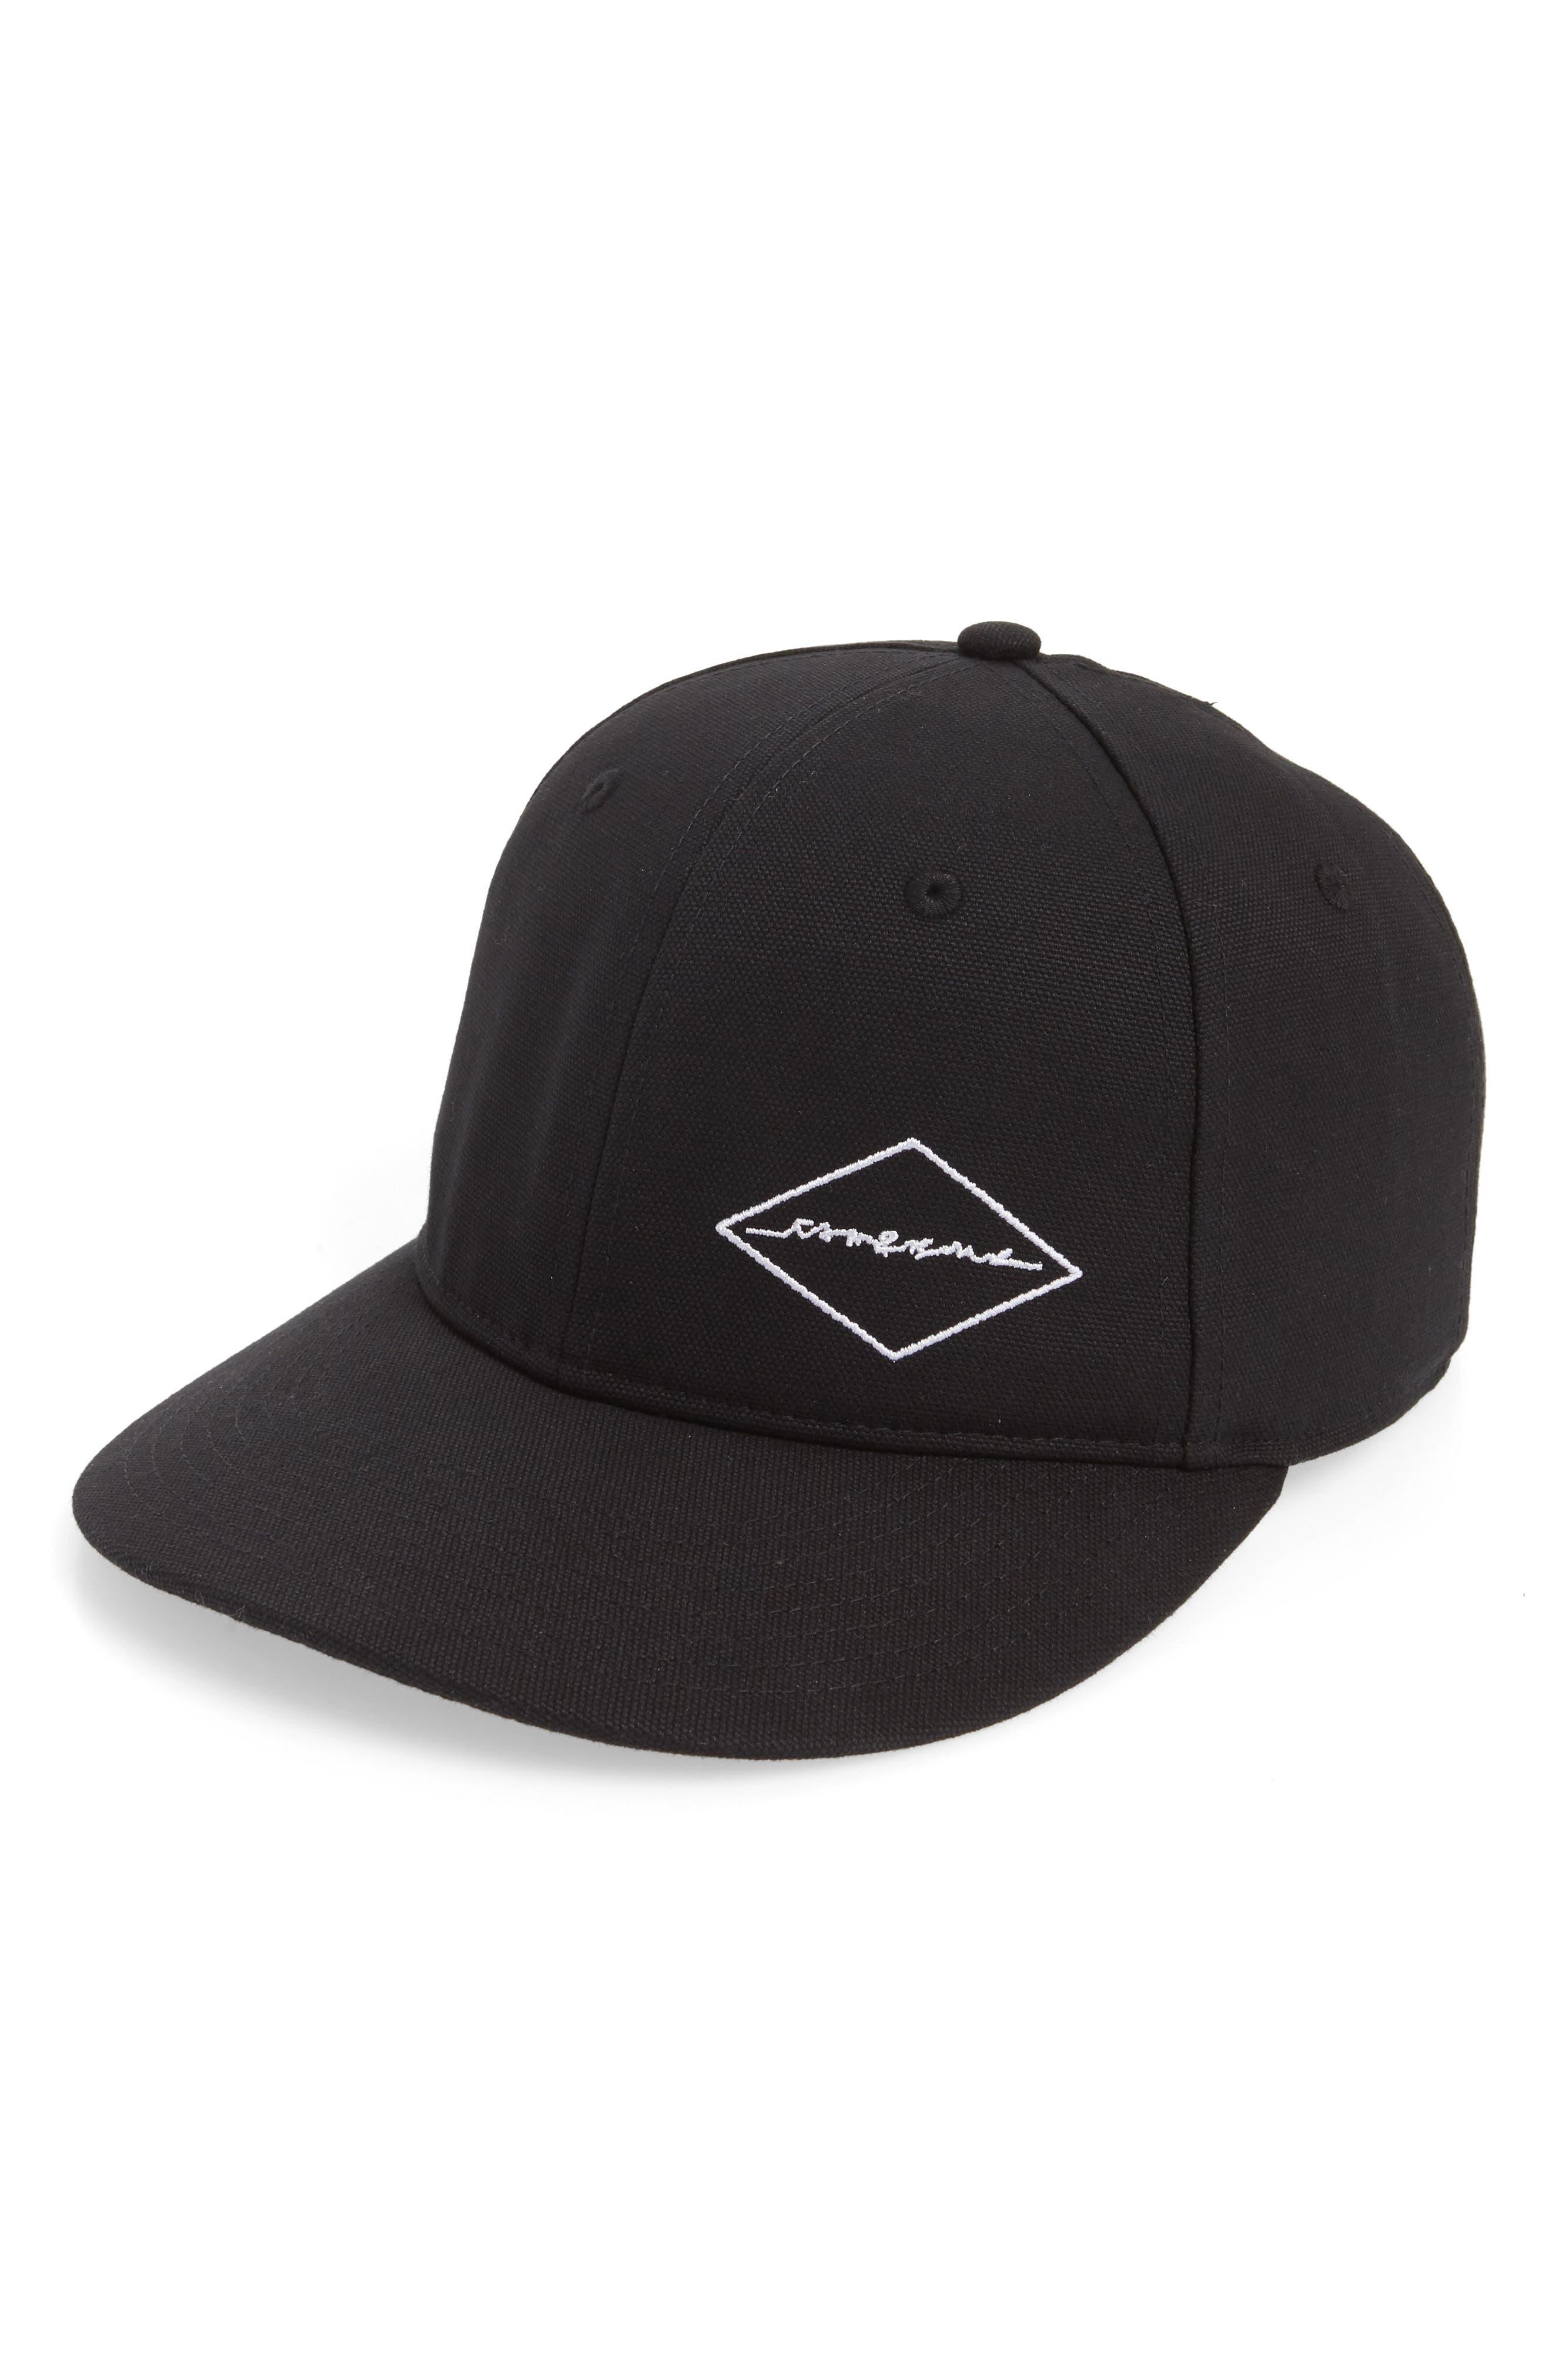 Dylan Canvas Baseball Cap,                         Main,                         color, BLACK DIAMOND